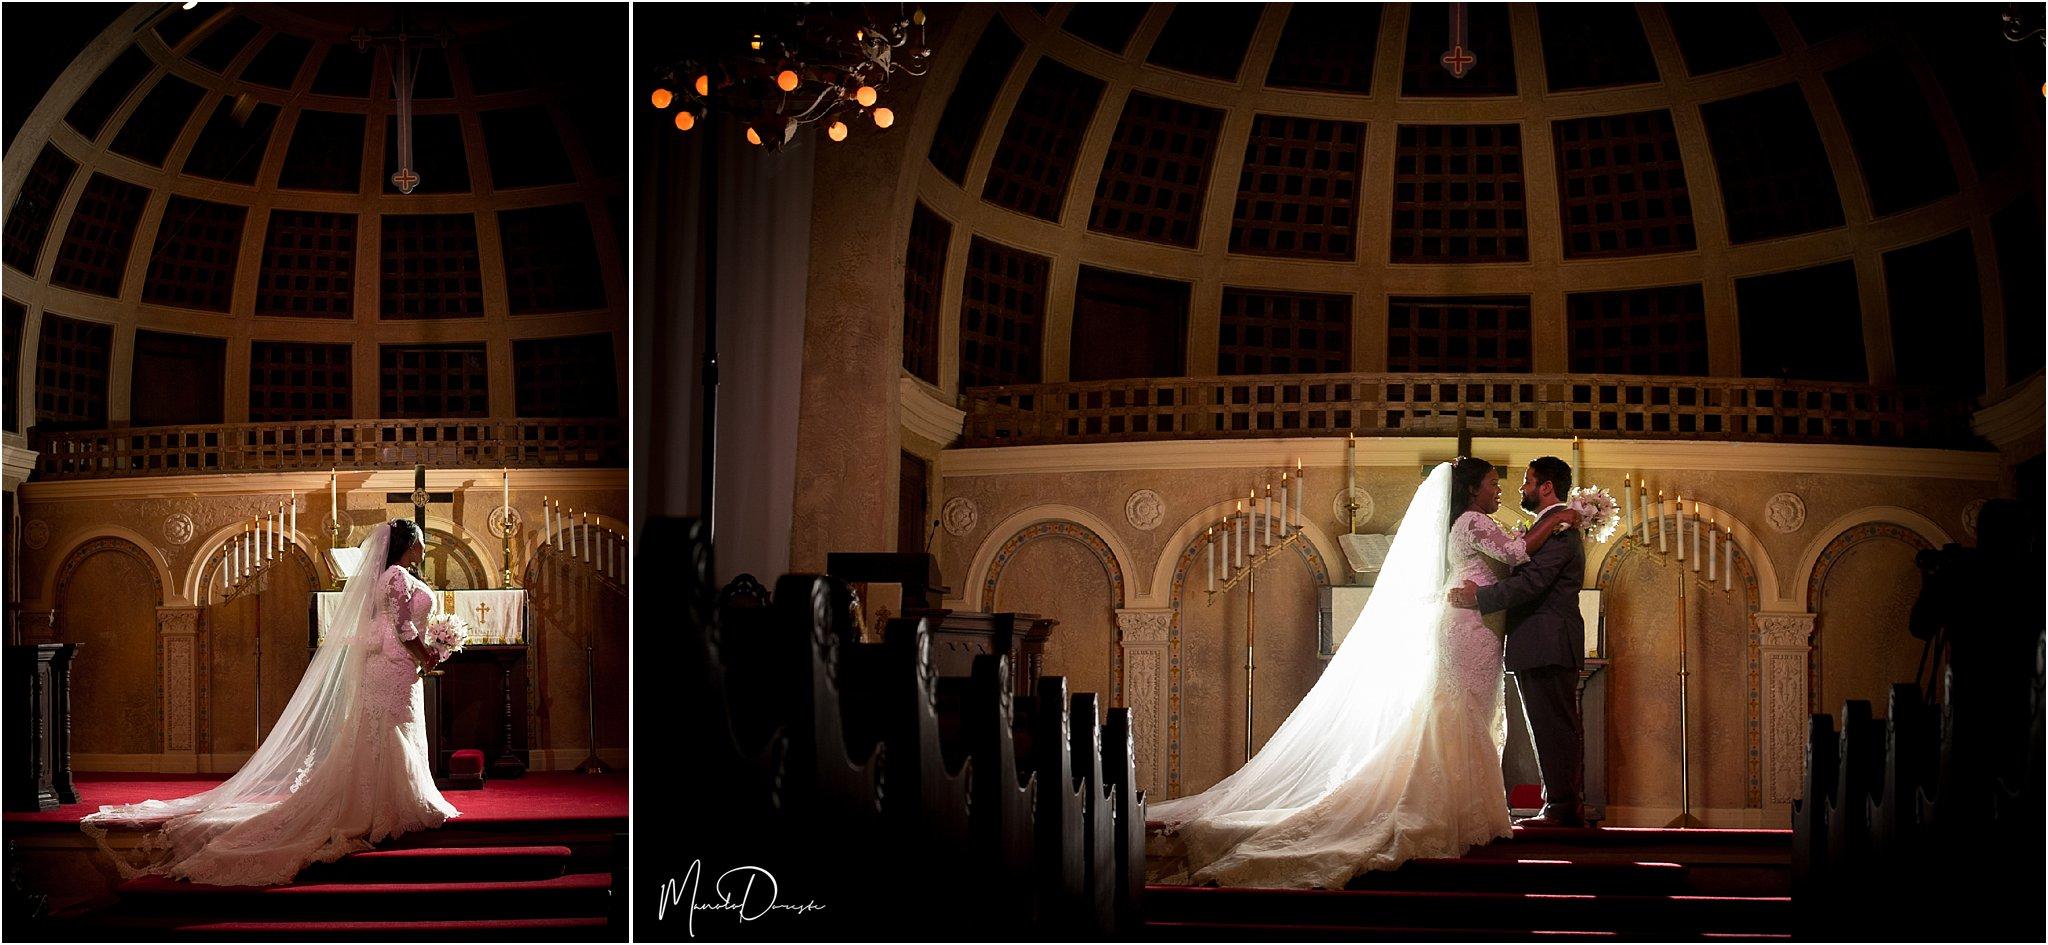 0425_ManoloDoreste_InFocusStudios_Wedding_Family_Photography_Miami_MiamiPhotographer.jpg